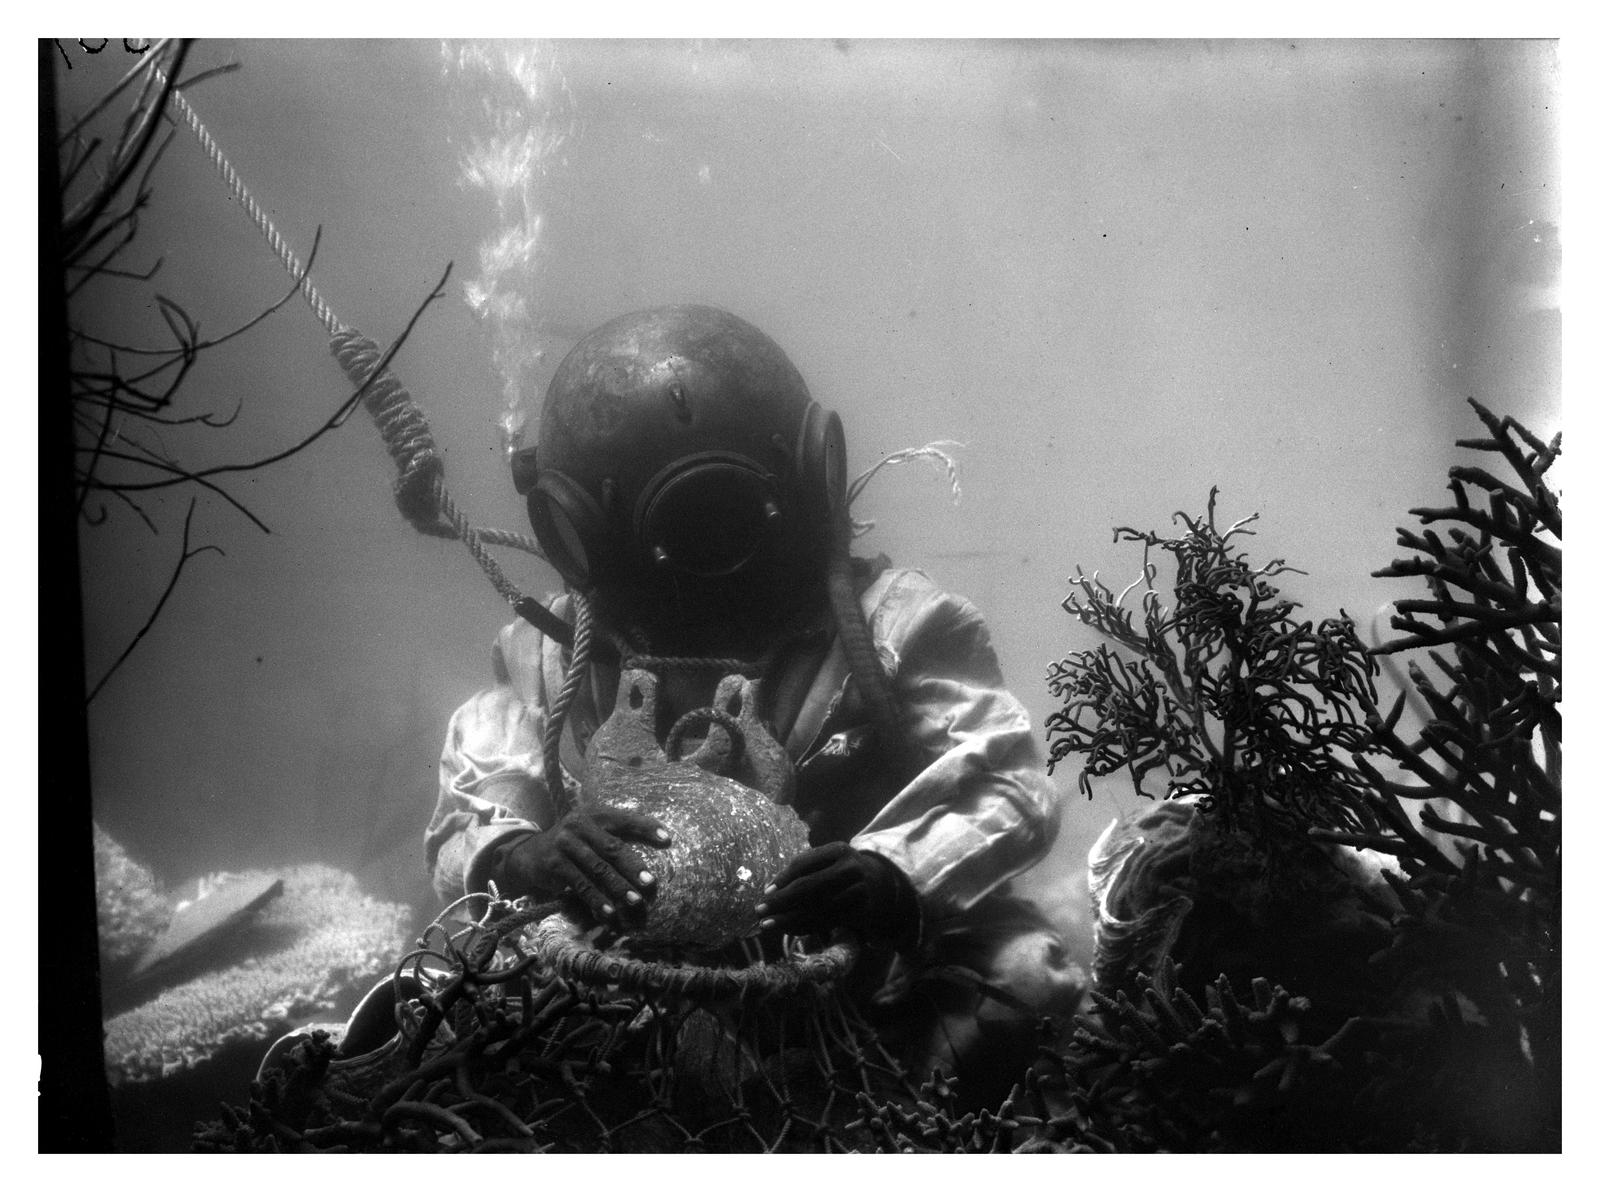 Frank Hurley underwater photograph